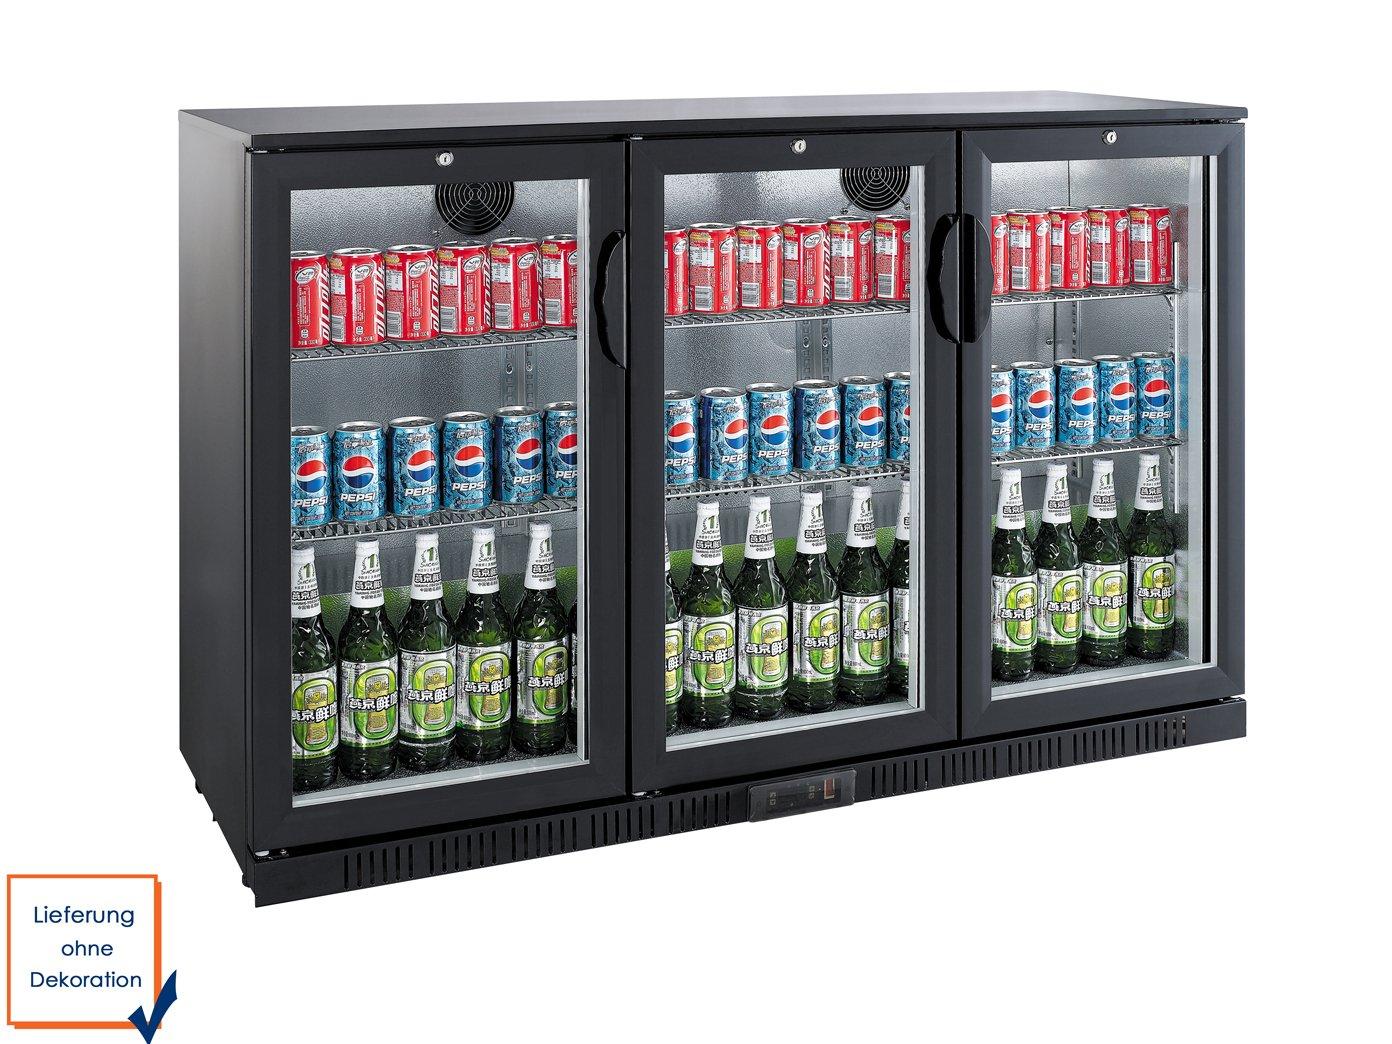 Profi Getränkekühlschrank, 330 Liter, 0° C/ +10° C, Umluftkühlung ...